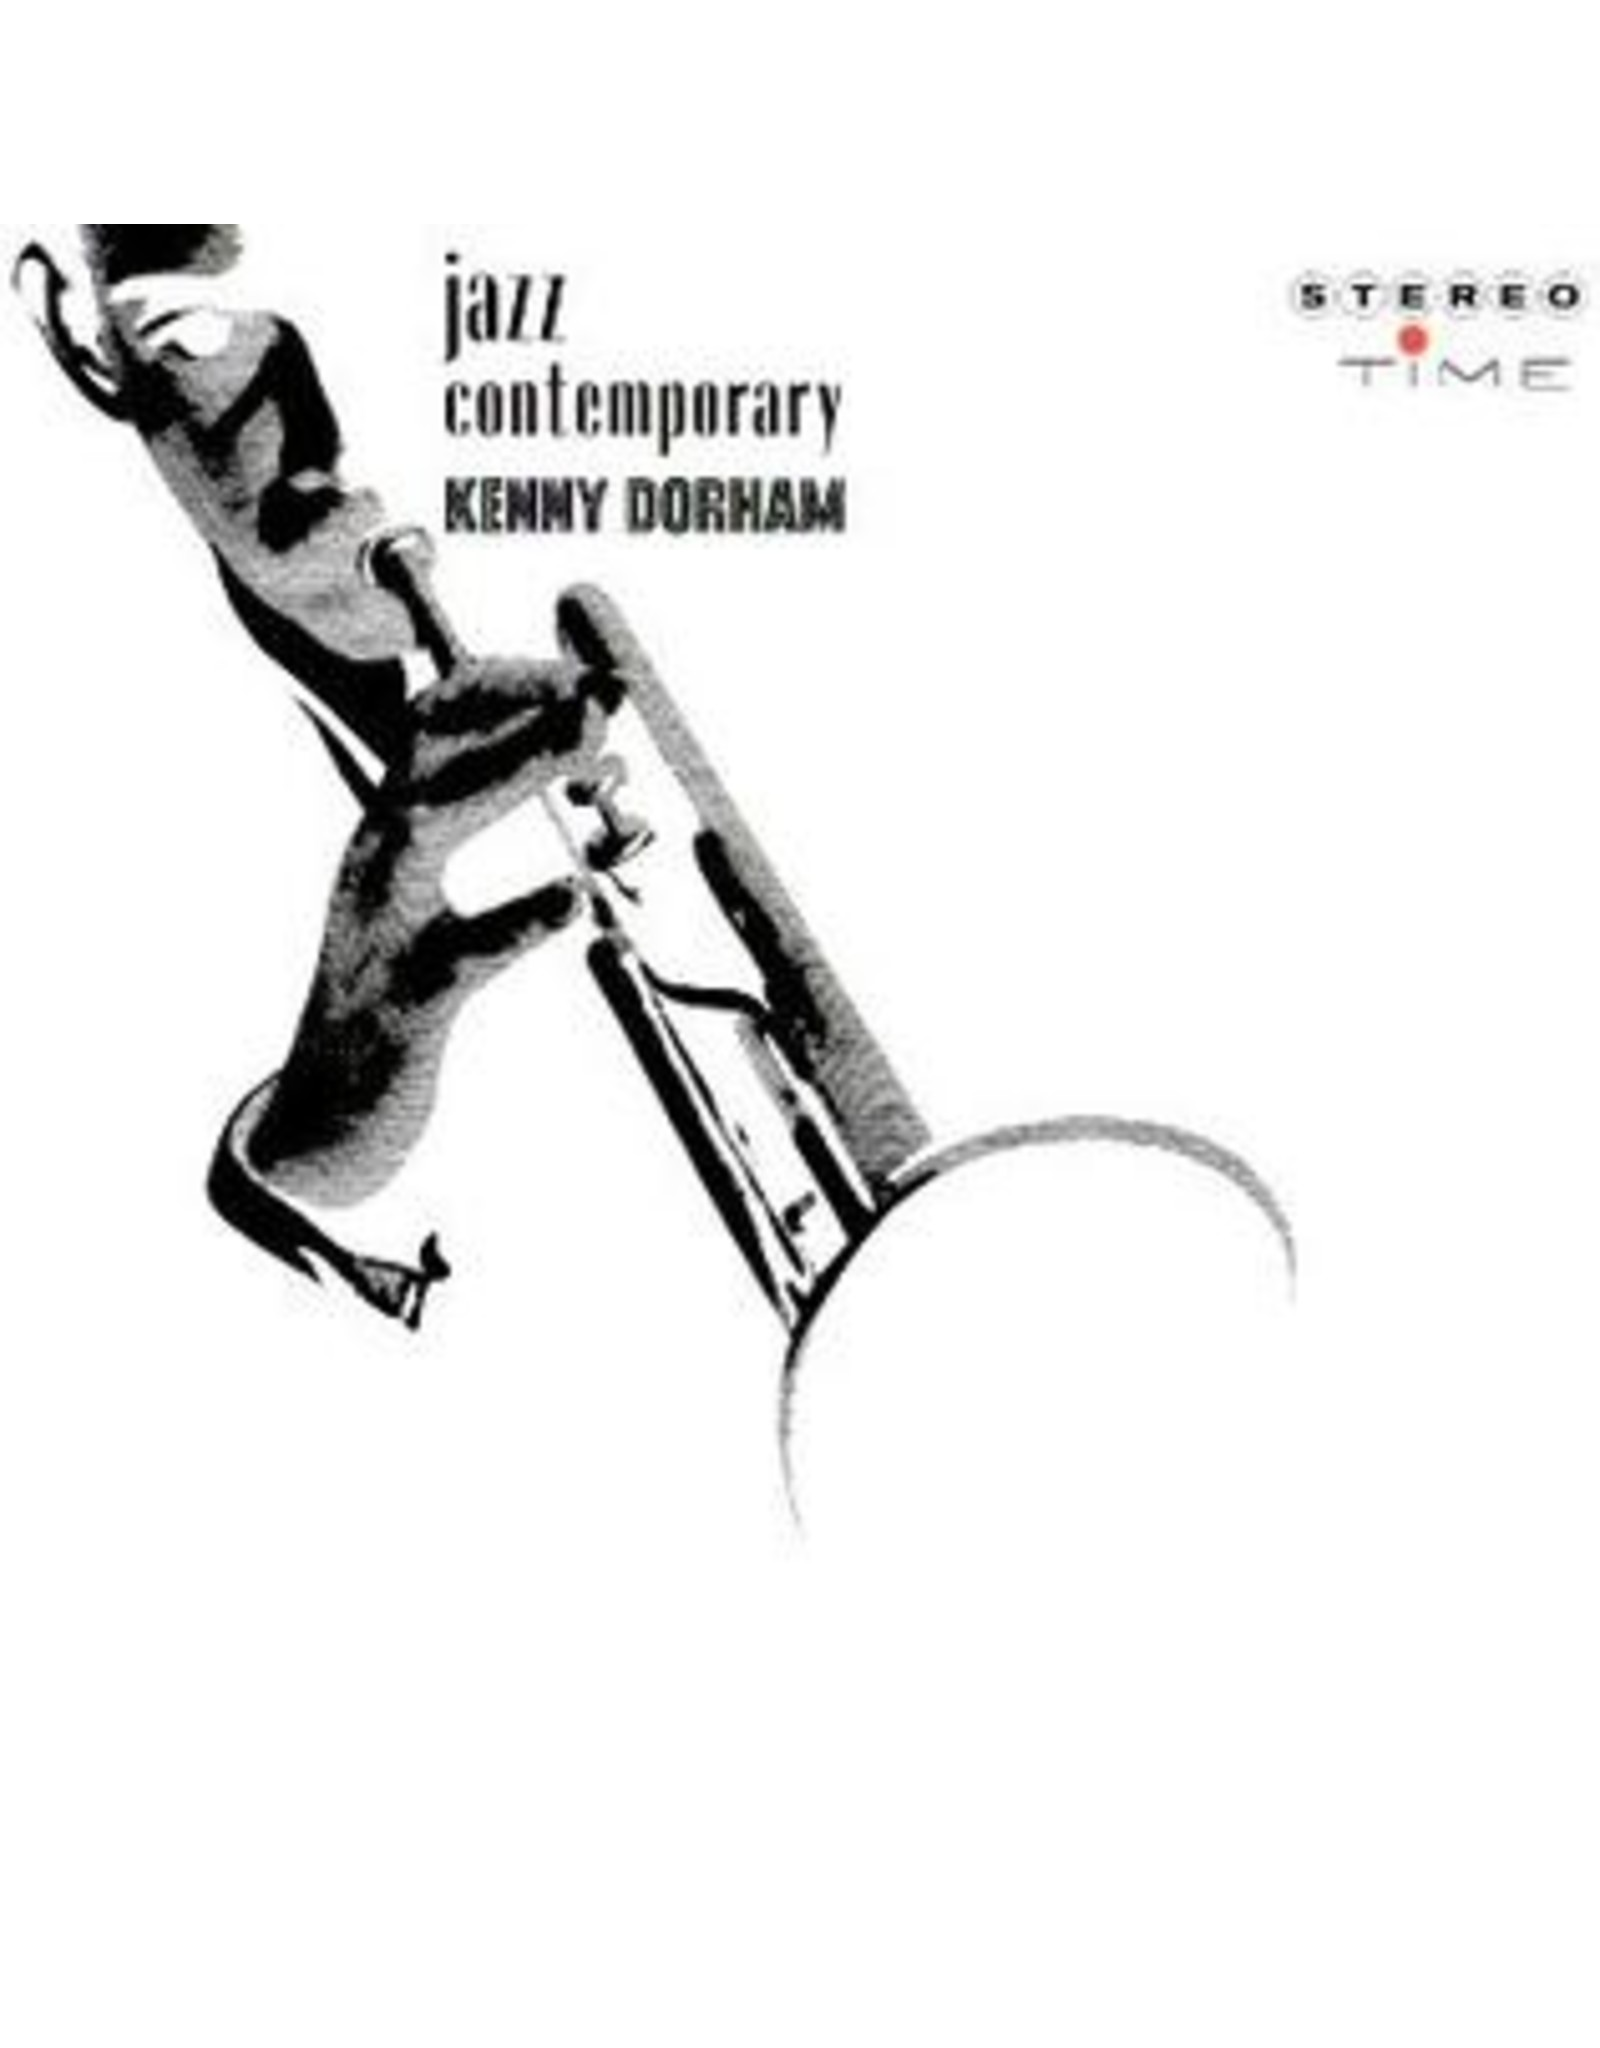 New Vinyl Kenny Dorham - Jazz Contemporary LP